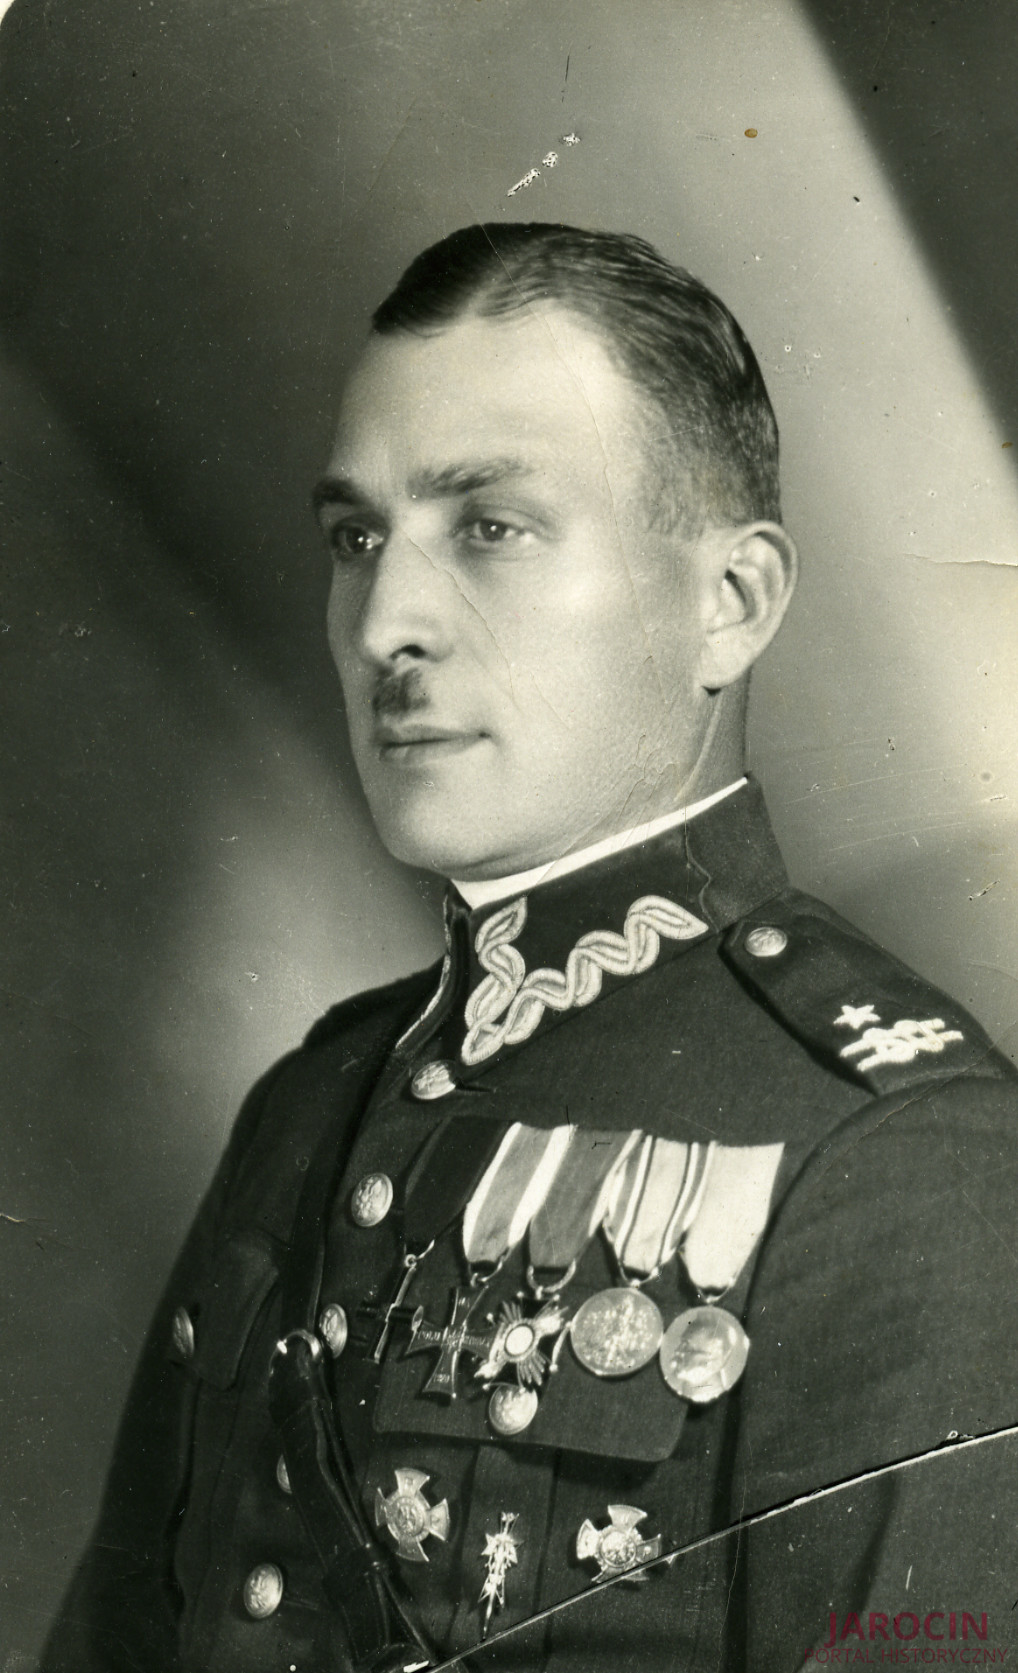 Kompania Braci – 3. kompania jarocińska. Obrona Sarnówki w 1919 r.